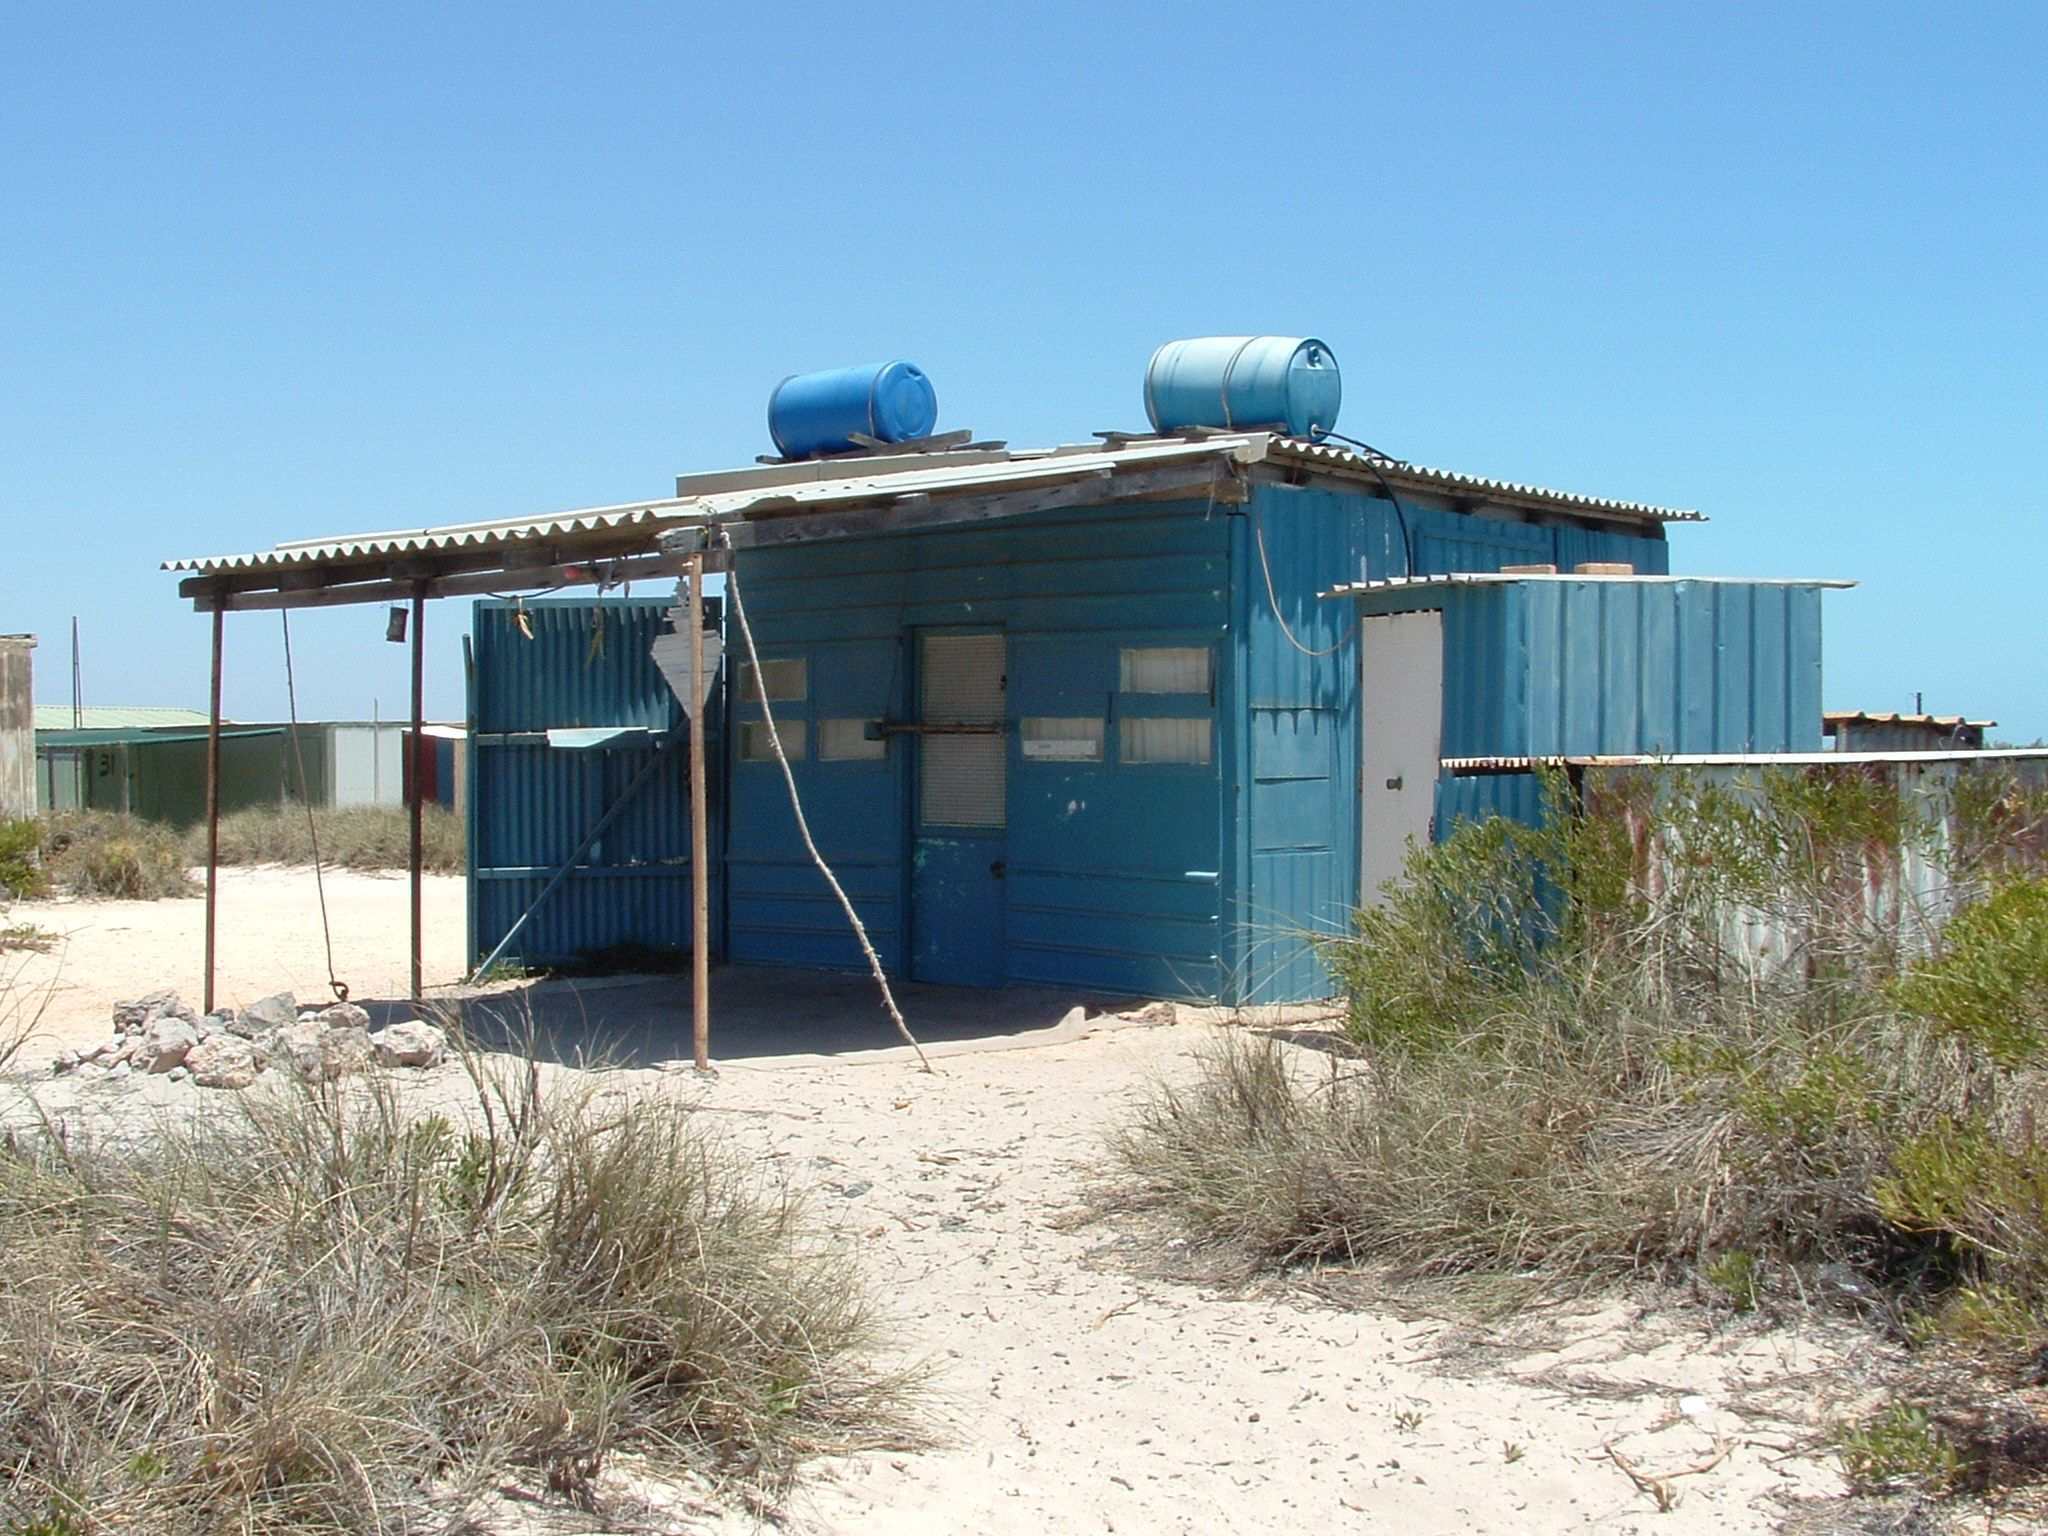 Beach shack : http://www.wanowandthen.com/blowholes.html